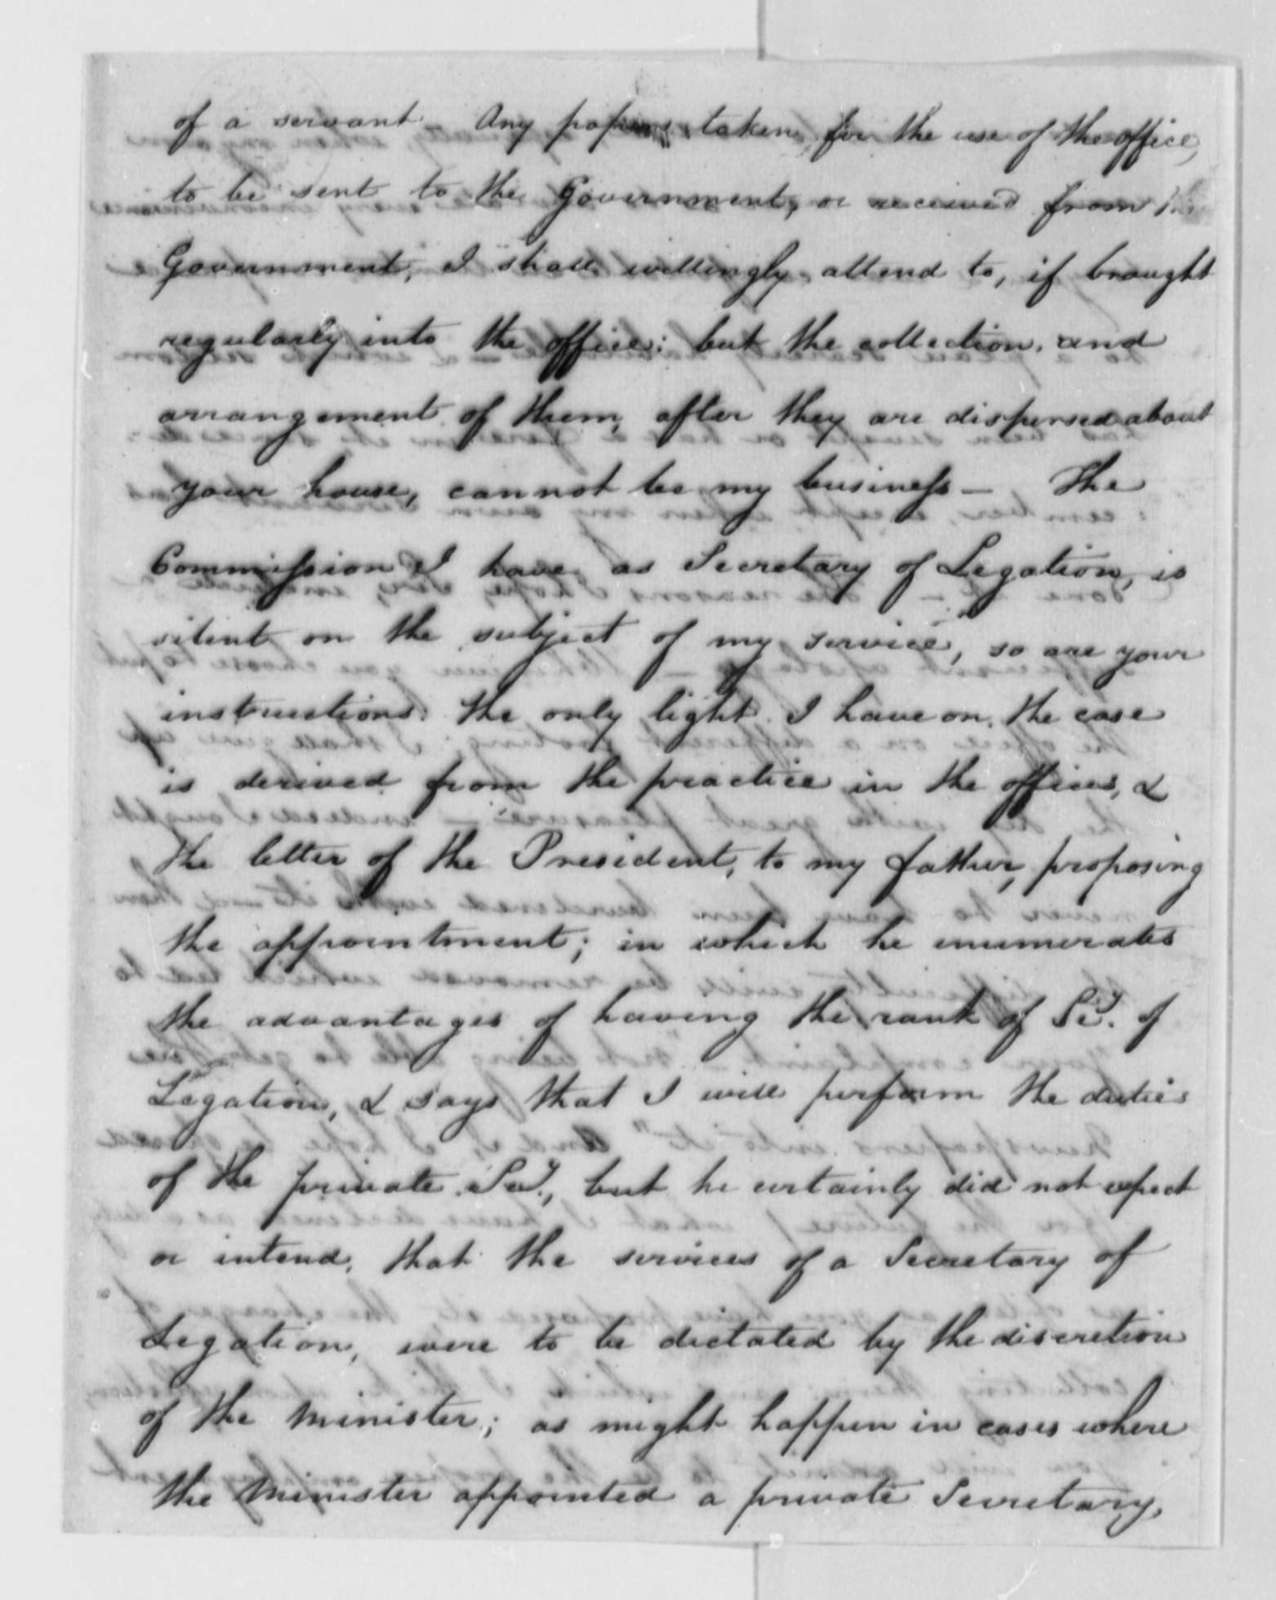 Thomas Sumter, Jr. to Robert R. Livingston, April 27, 1802